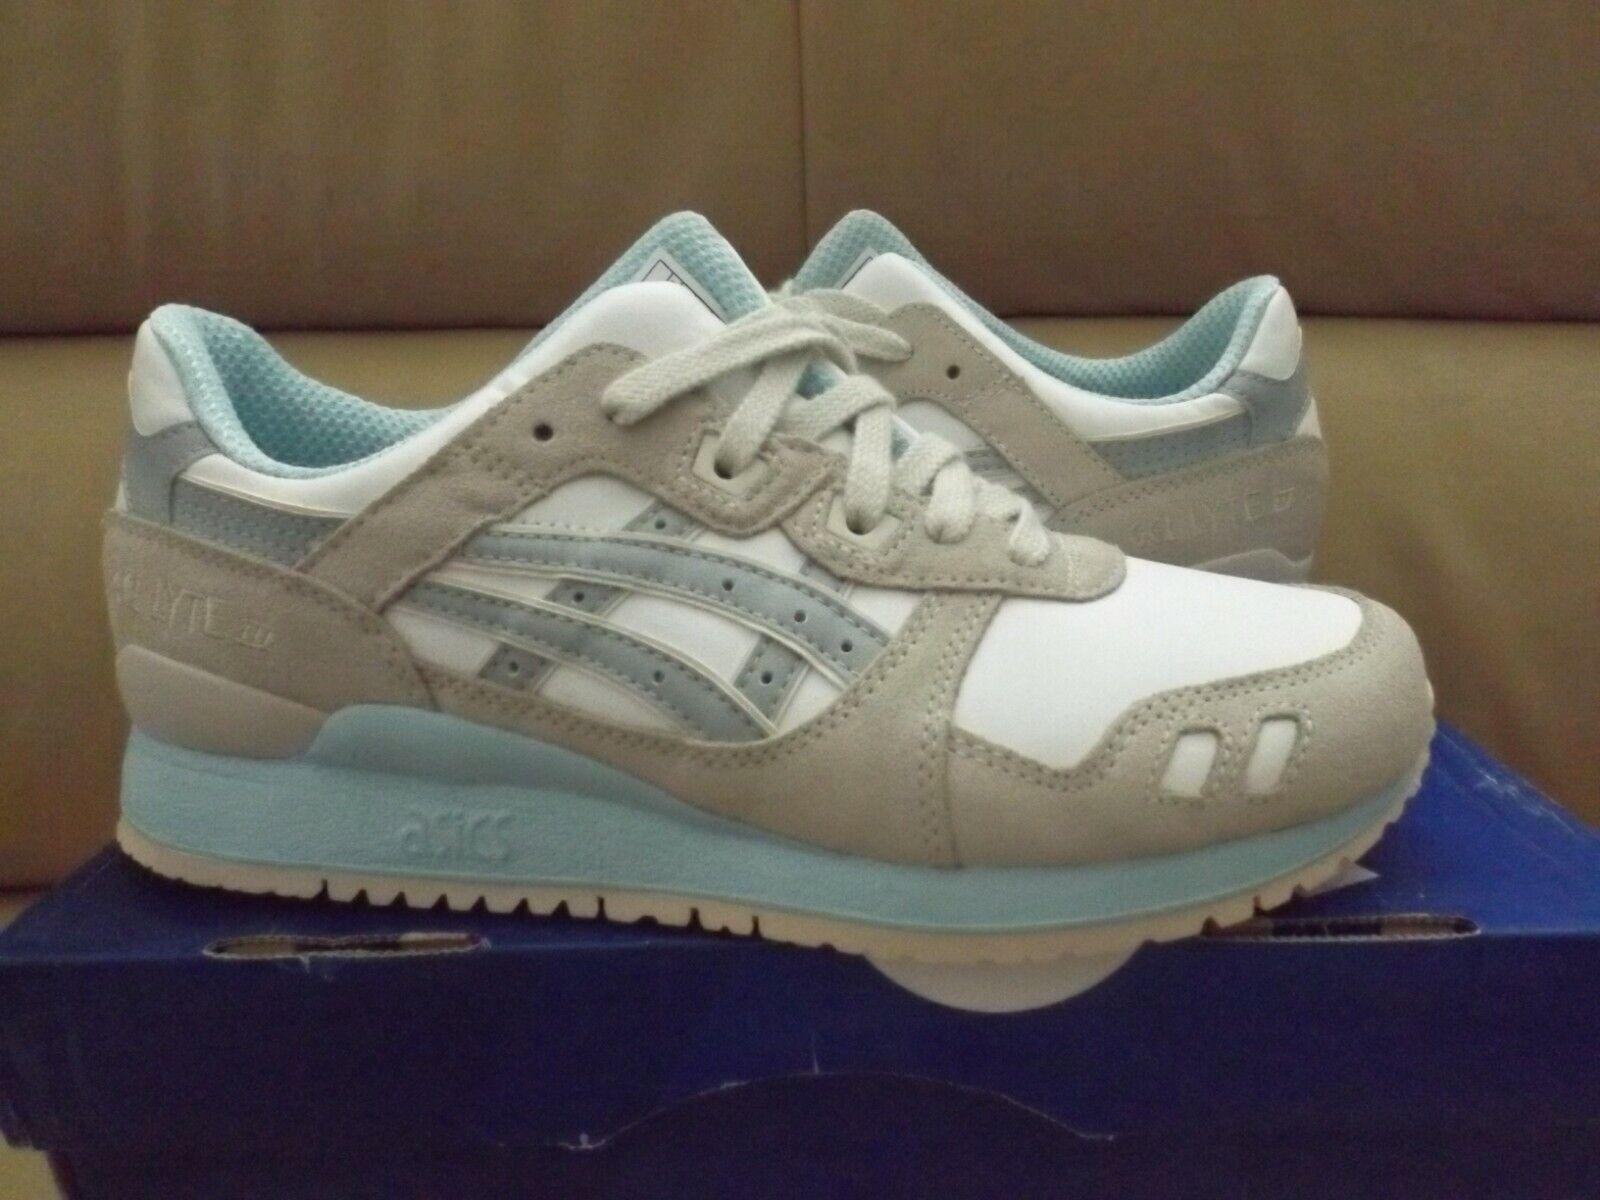 padre Formular Préstamo de dinero  ASICS GEL Lyte III White/light Grey Shoes Trainers Runner Leather White  H6u9l EUR 37.5 for sale online | eBay